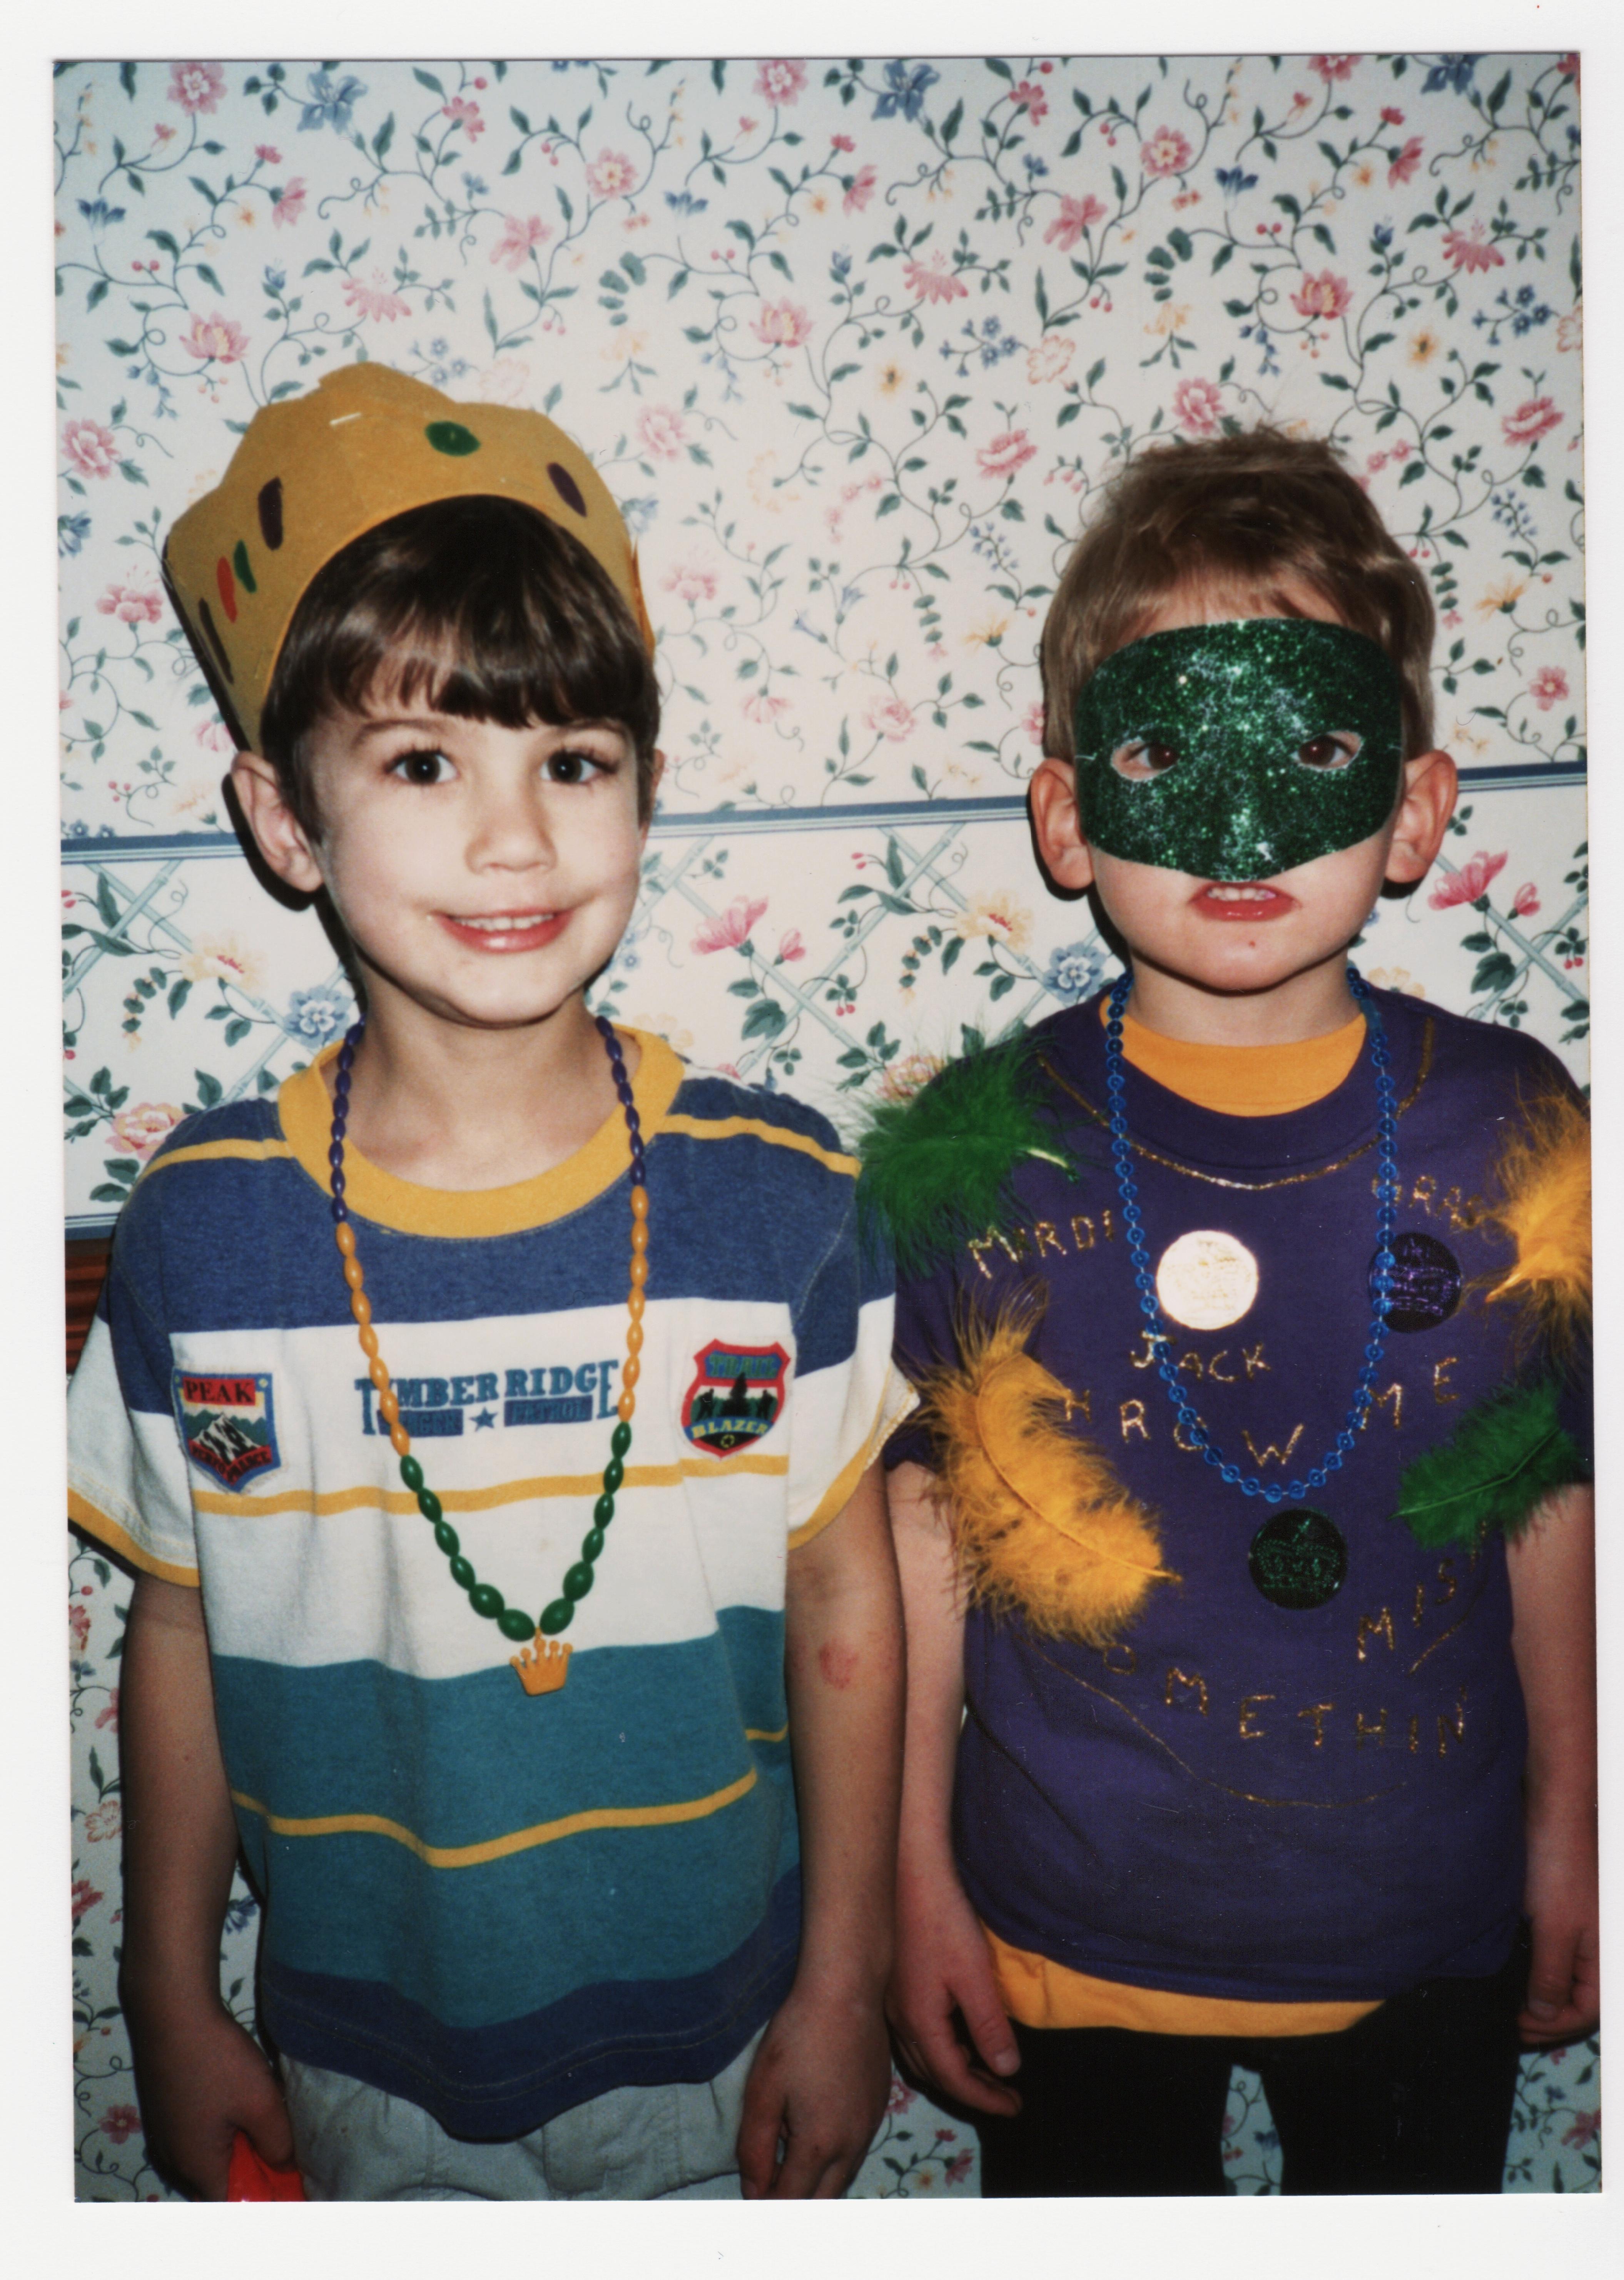 boys dressed for Mardi Gras at school